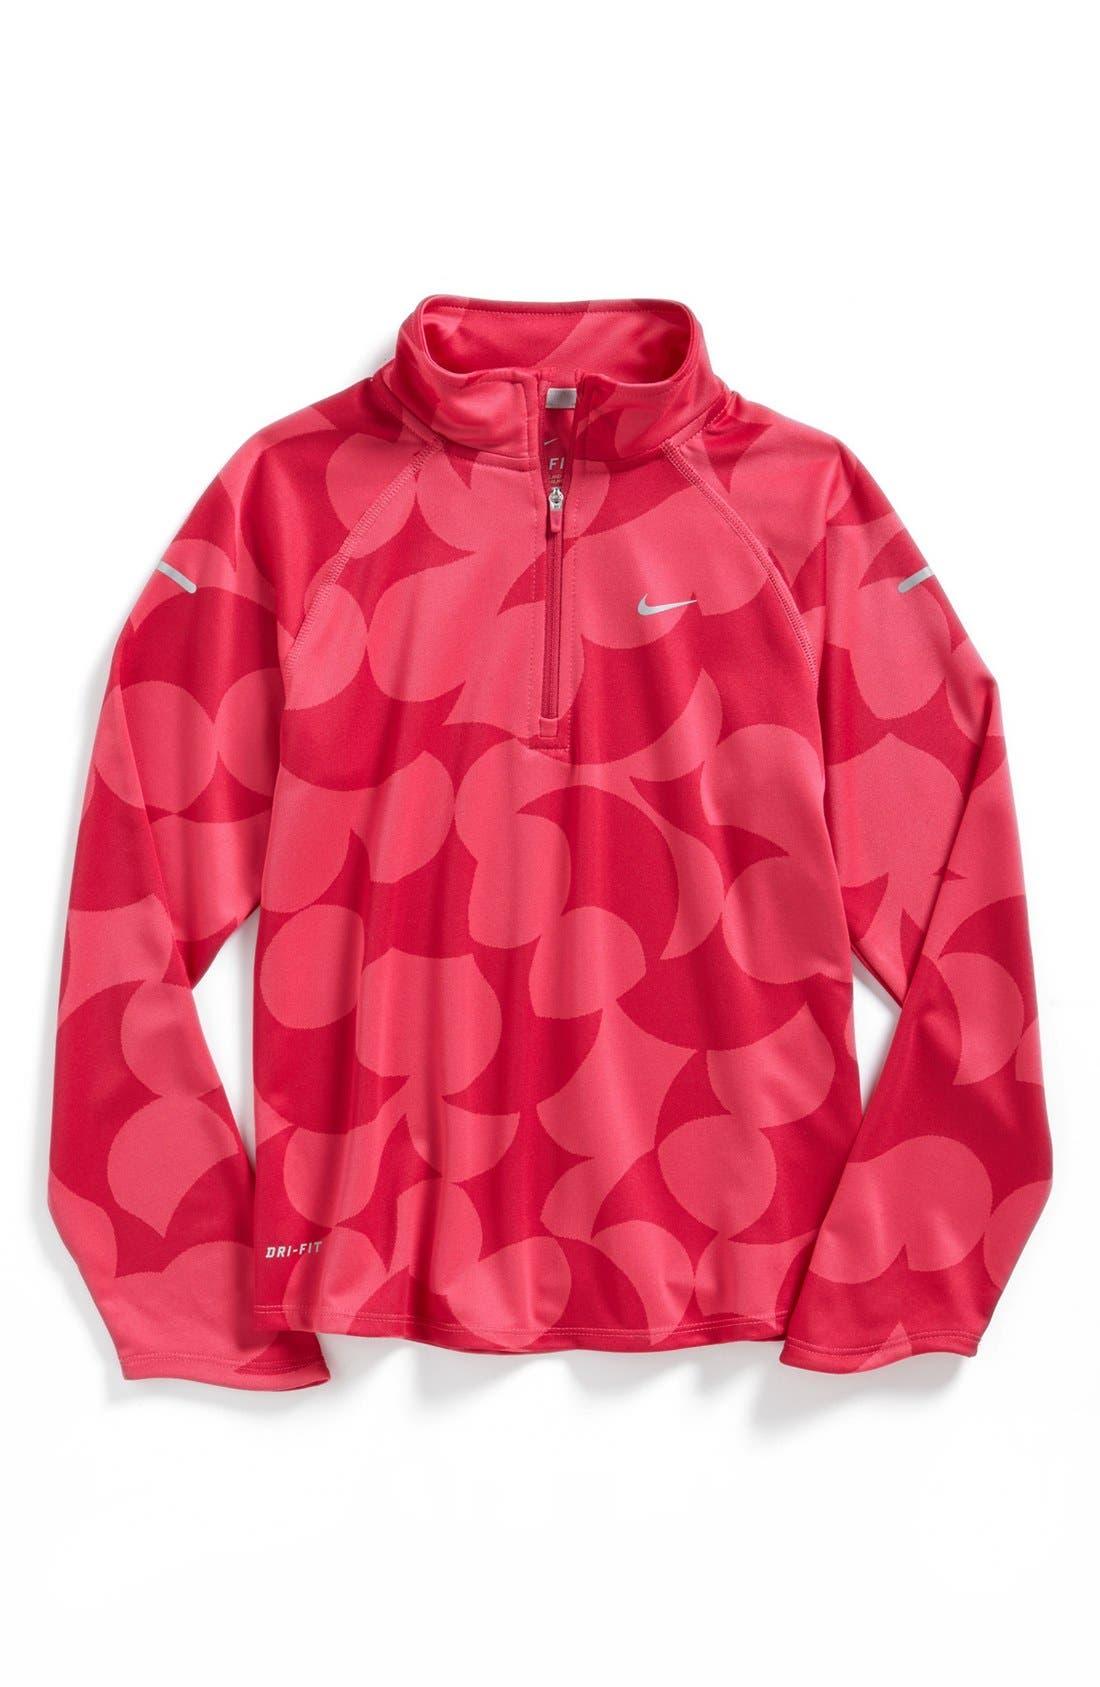 Main Image - Nike 'Element' Dri-FIT Half Zip Running Top (Big Girls)